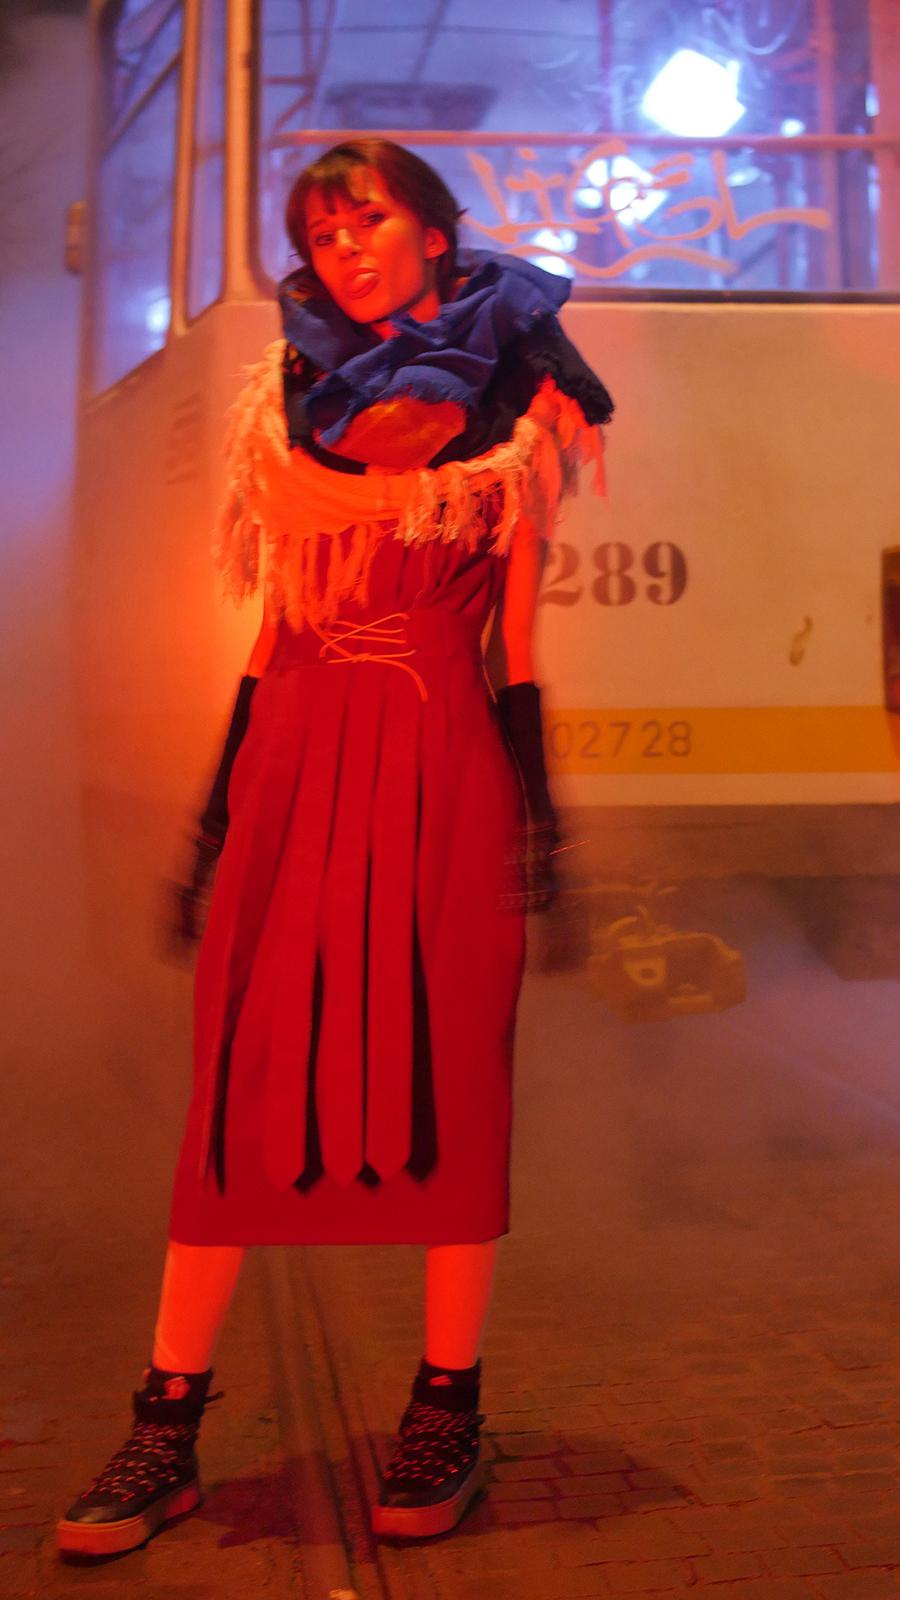 Ruxandra_shop_Fork_dress insta.jpg